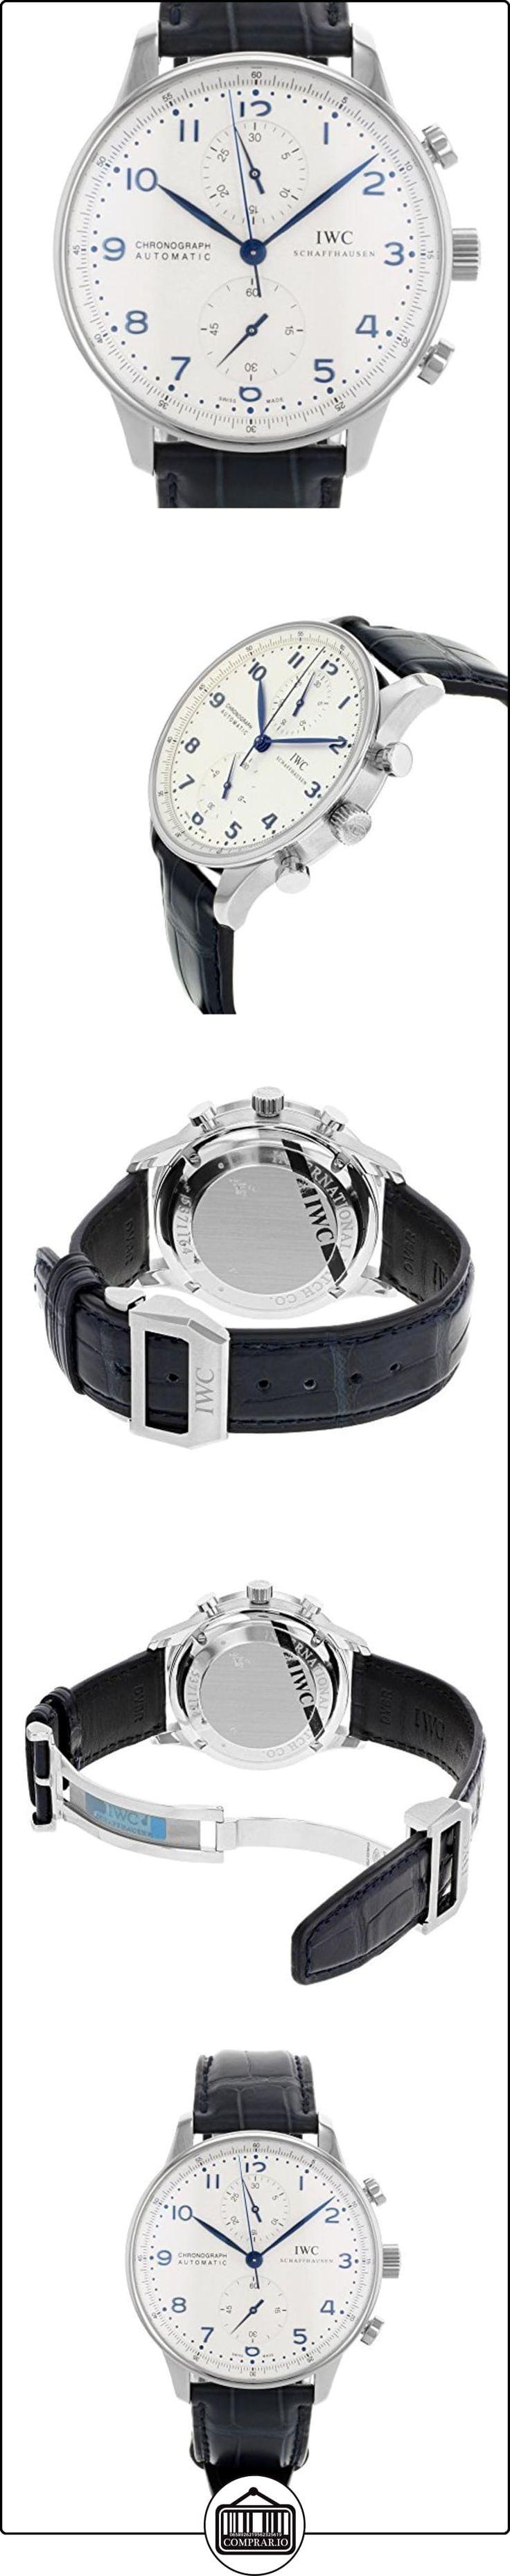 IWC IW371446 - Reloj para hombres de  ✿ Relojes para hombre - (Lujo) ✿